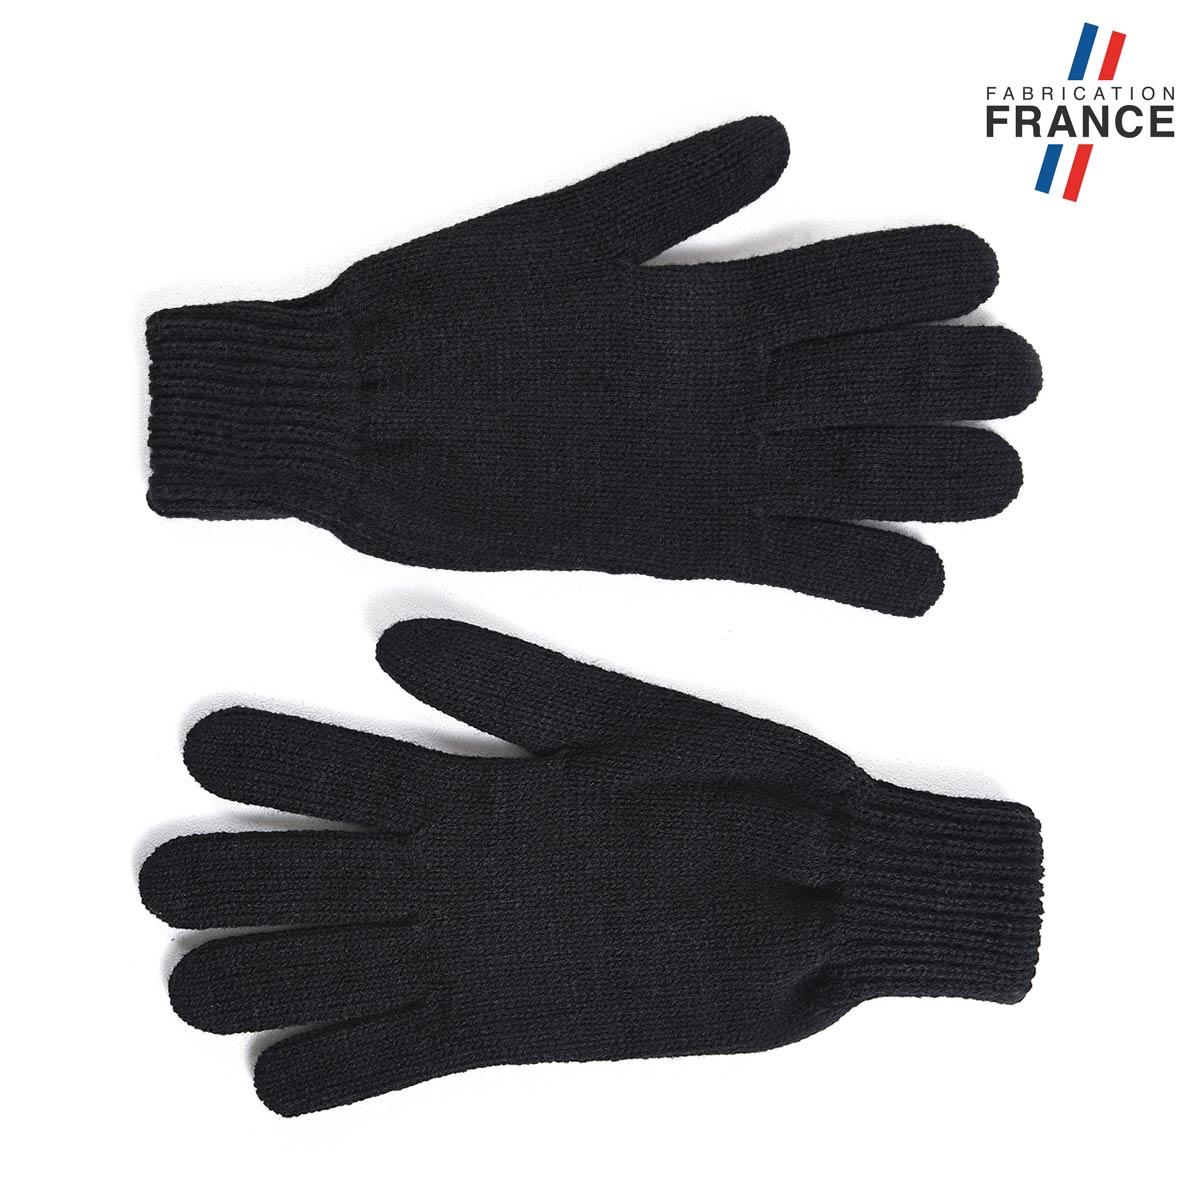 GA-00042_A12-1FR_Gants-noirs_Fabriques-en_France